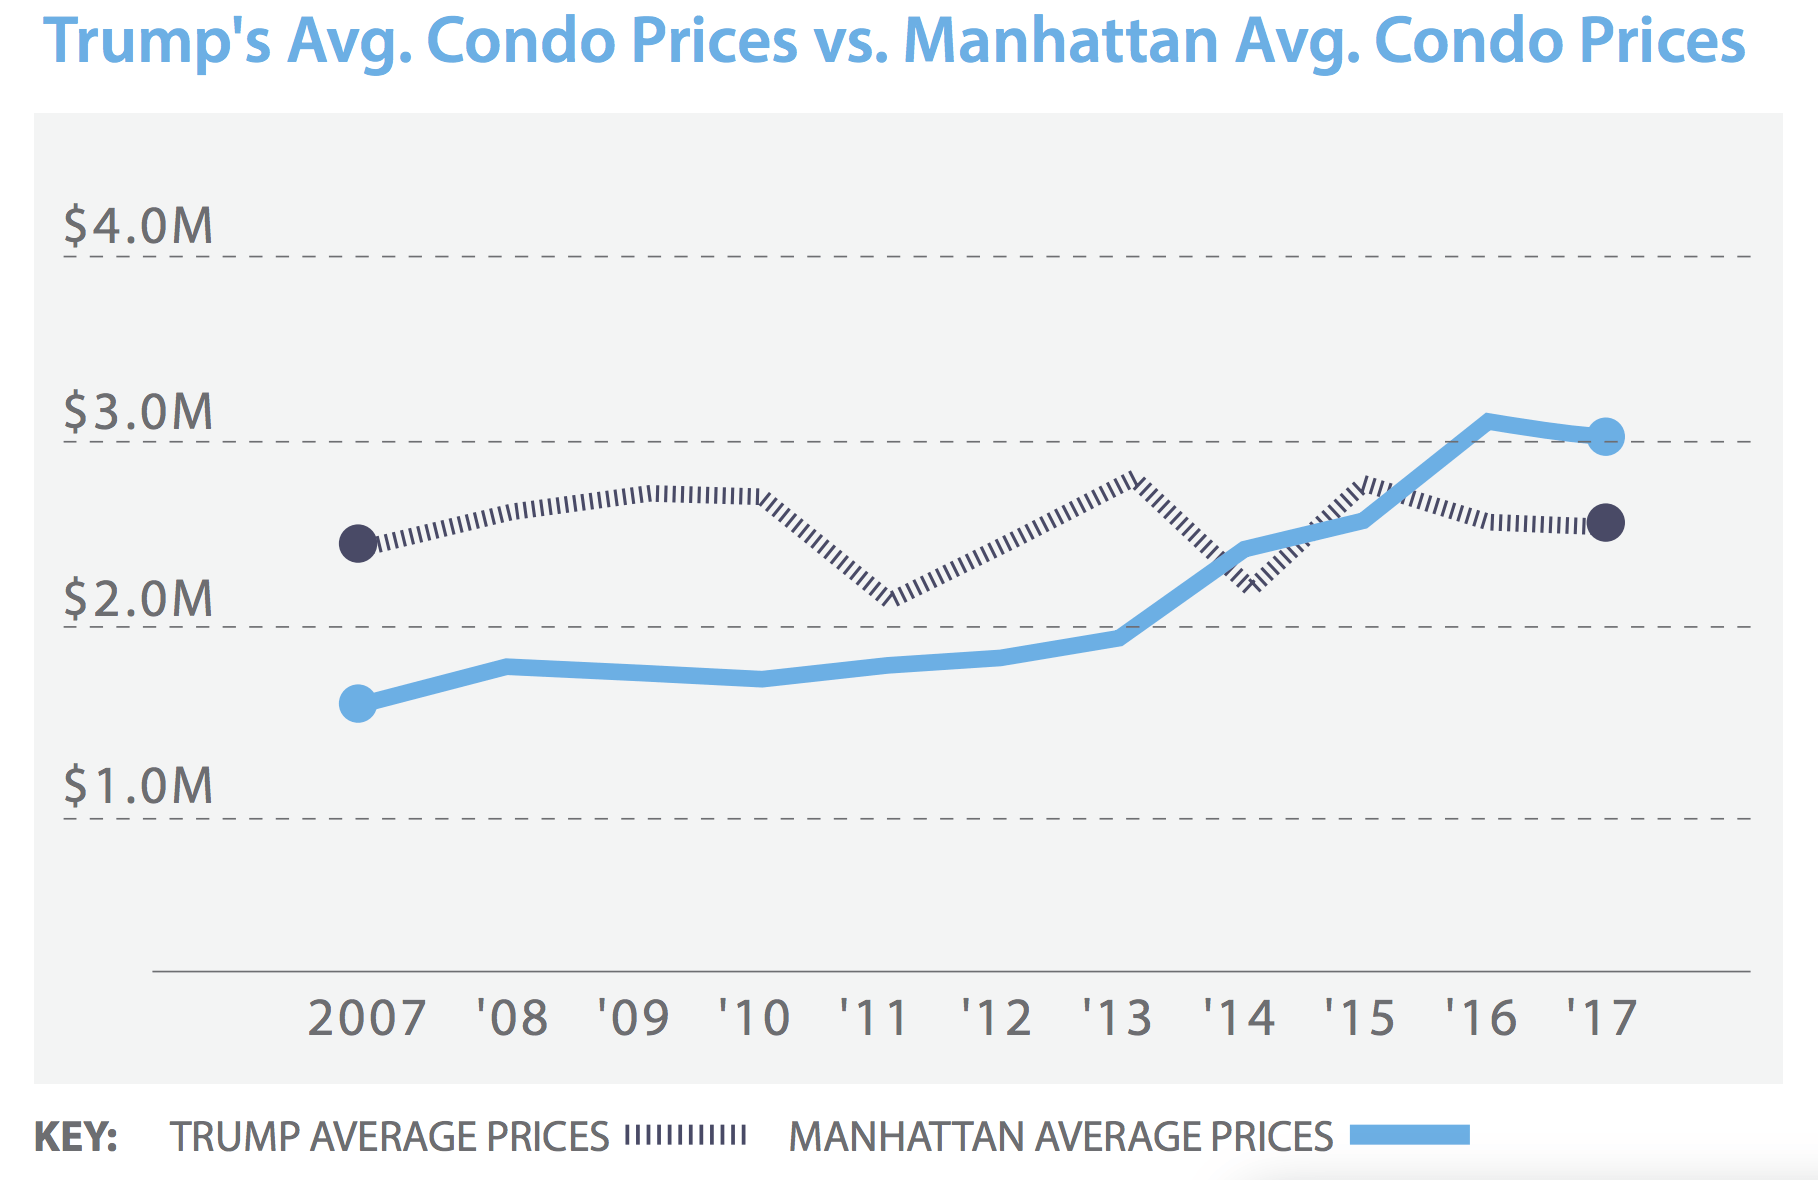 Sales at NYC's 11 Trump-branded condos fall below average